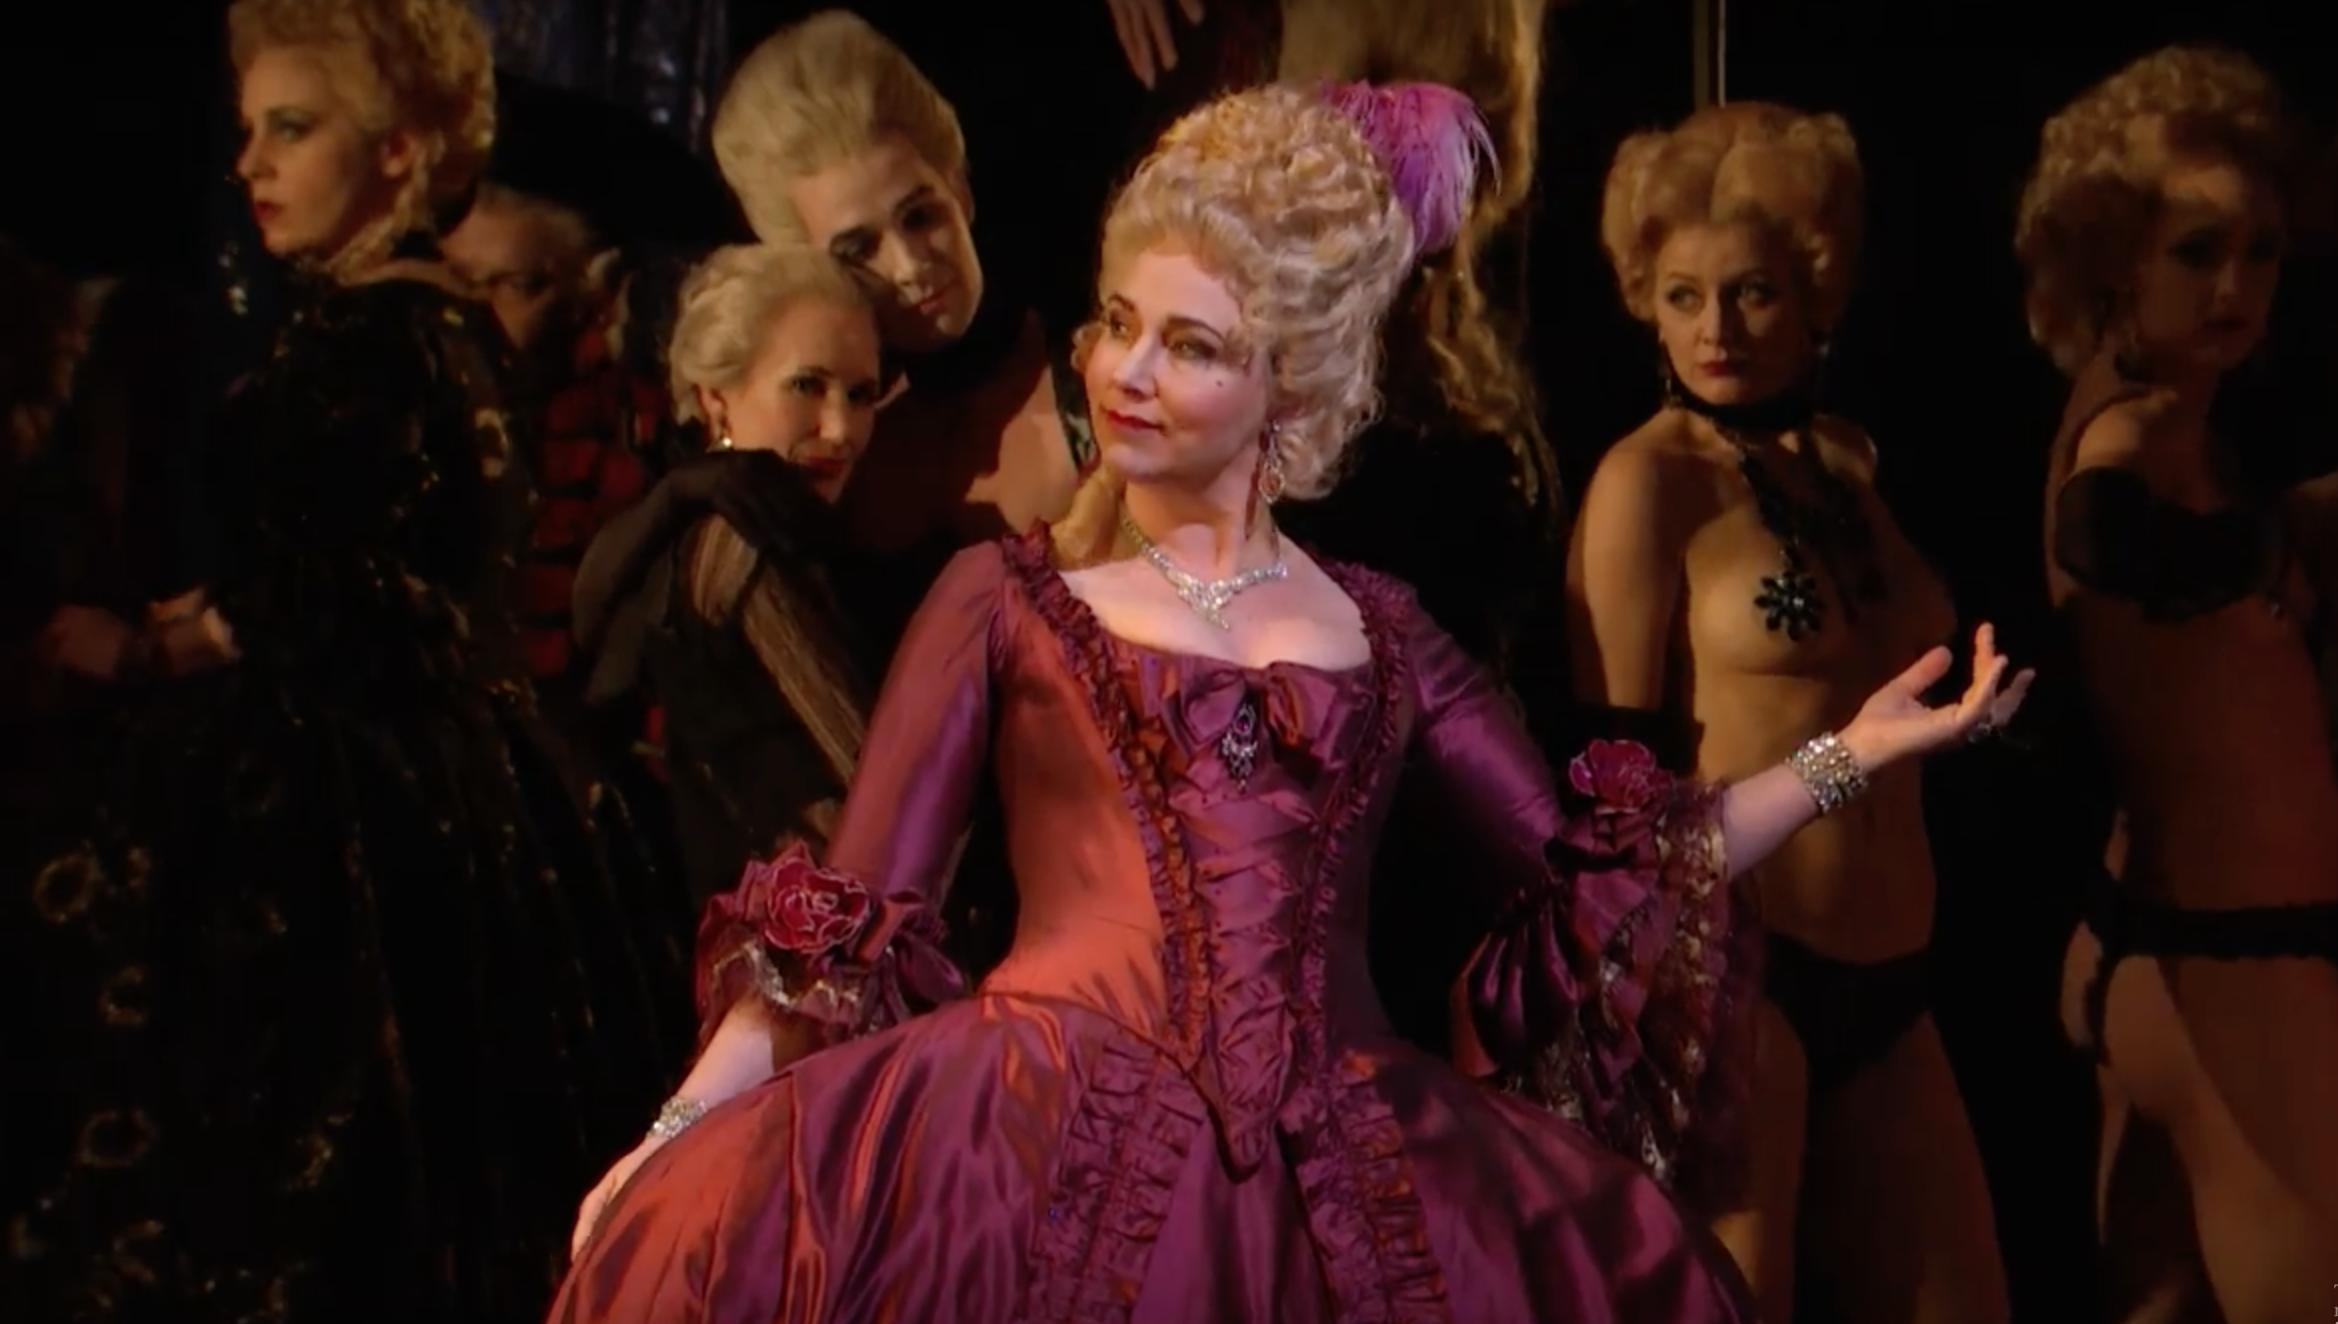 Metropolitan opera nipple pasties